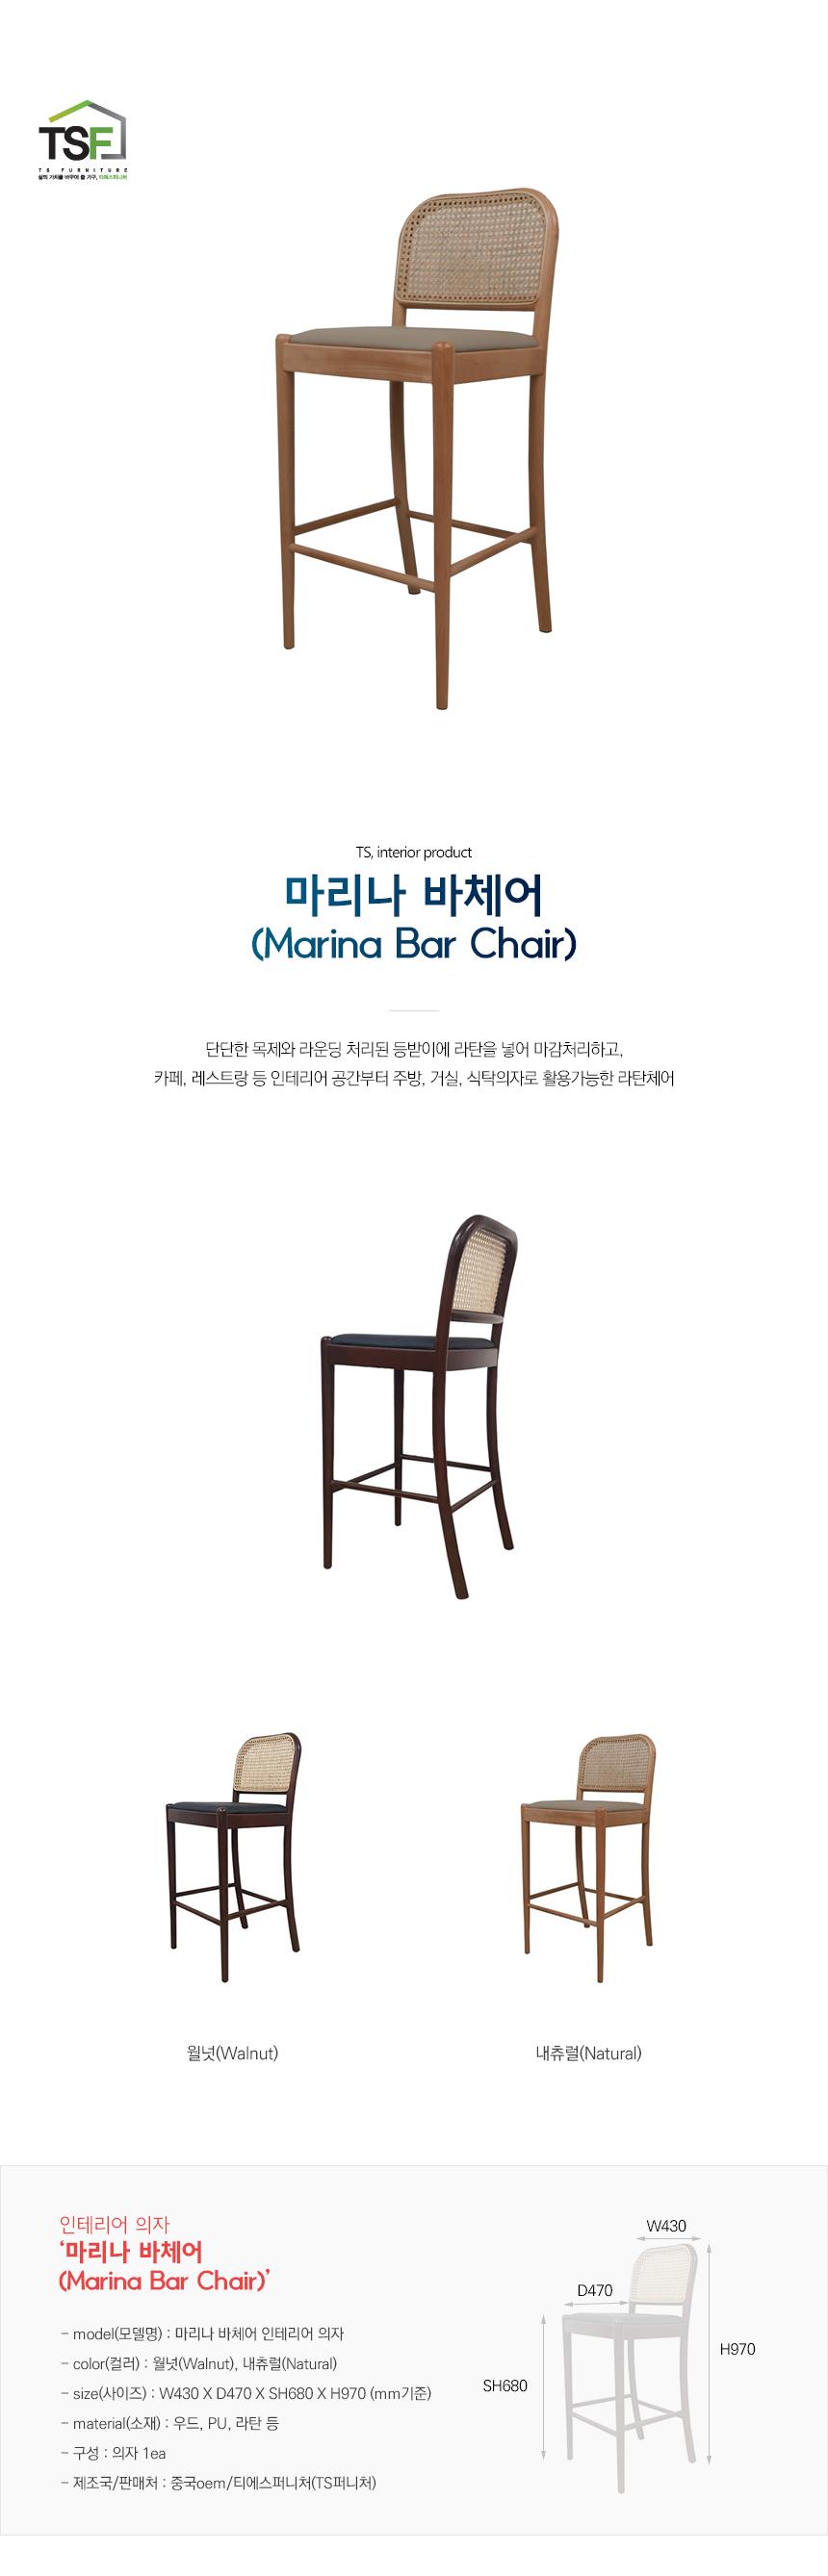 I 마리나 바체어 인테리어 의자 - 주식회사 티에스퍼니처, 176,500원, 디자인 의자, 스틸의자